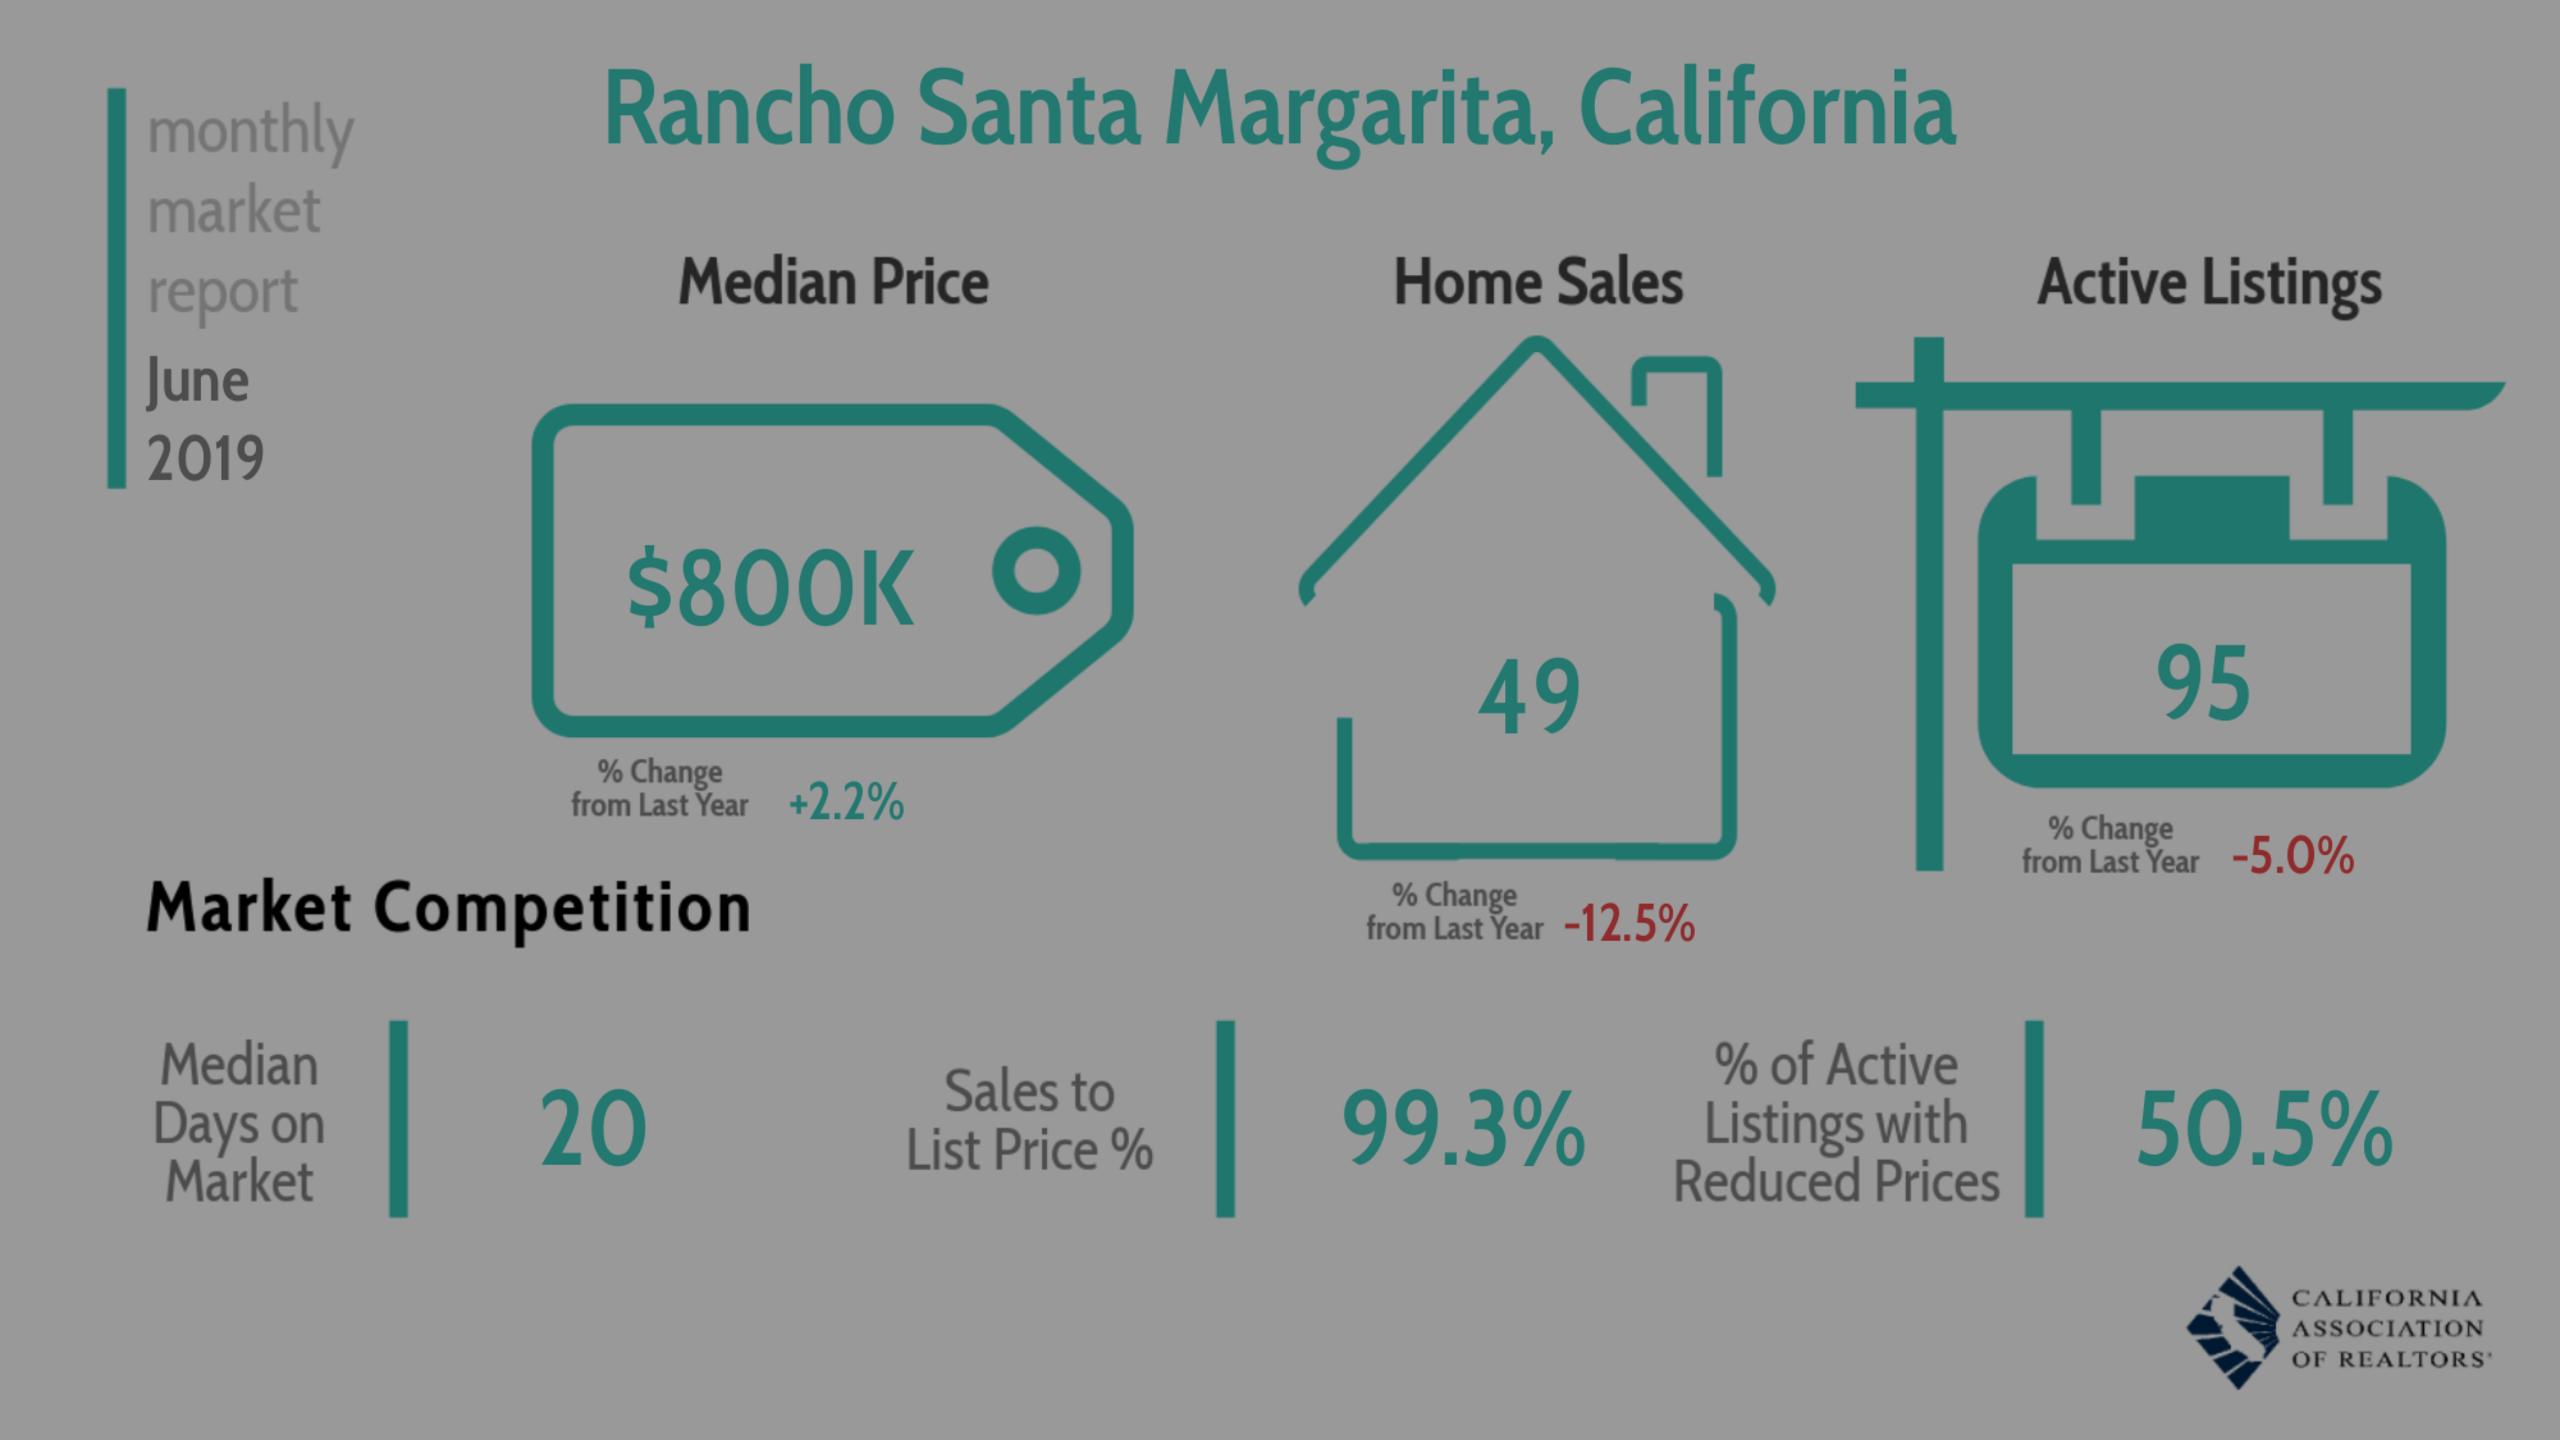 Monthly Market Report June 2019 – Rancho Santa Margarita